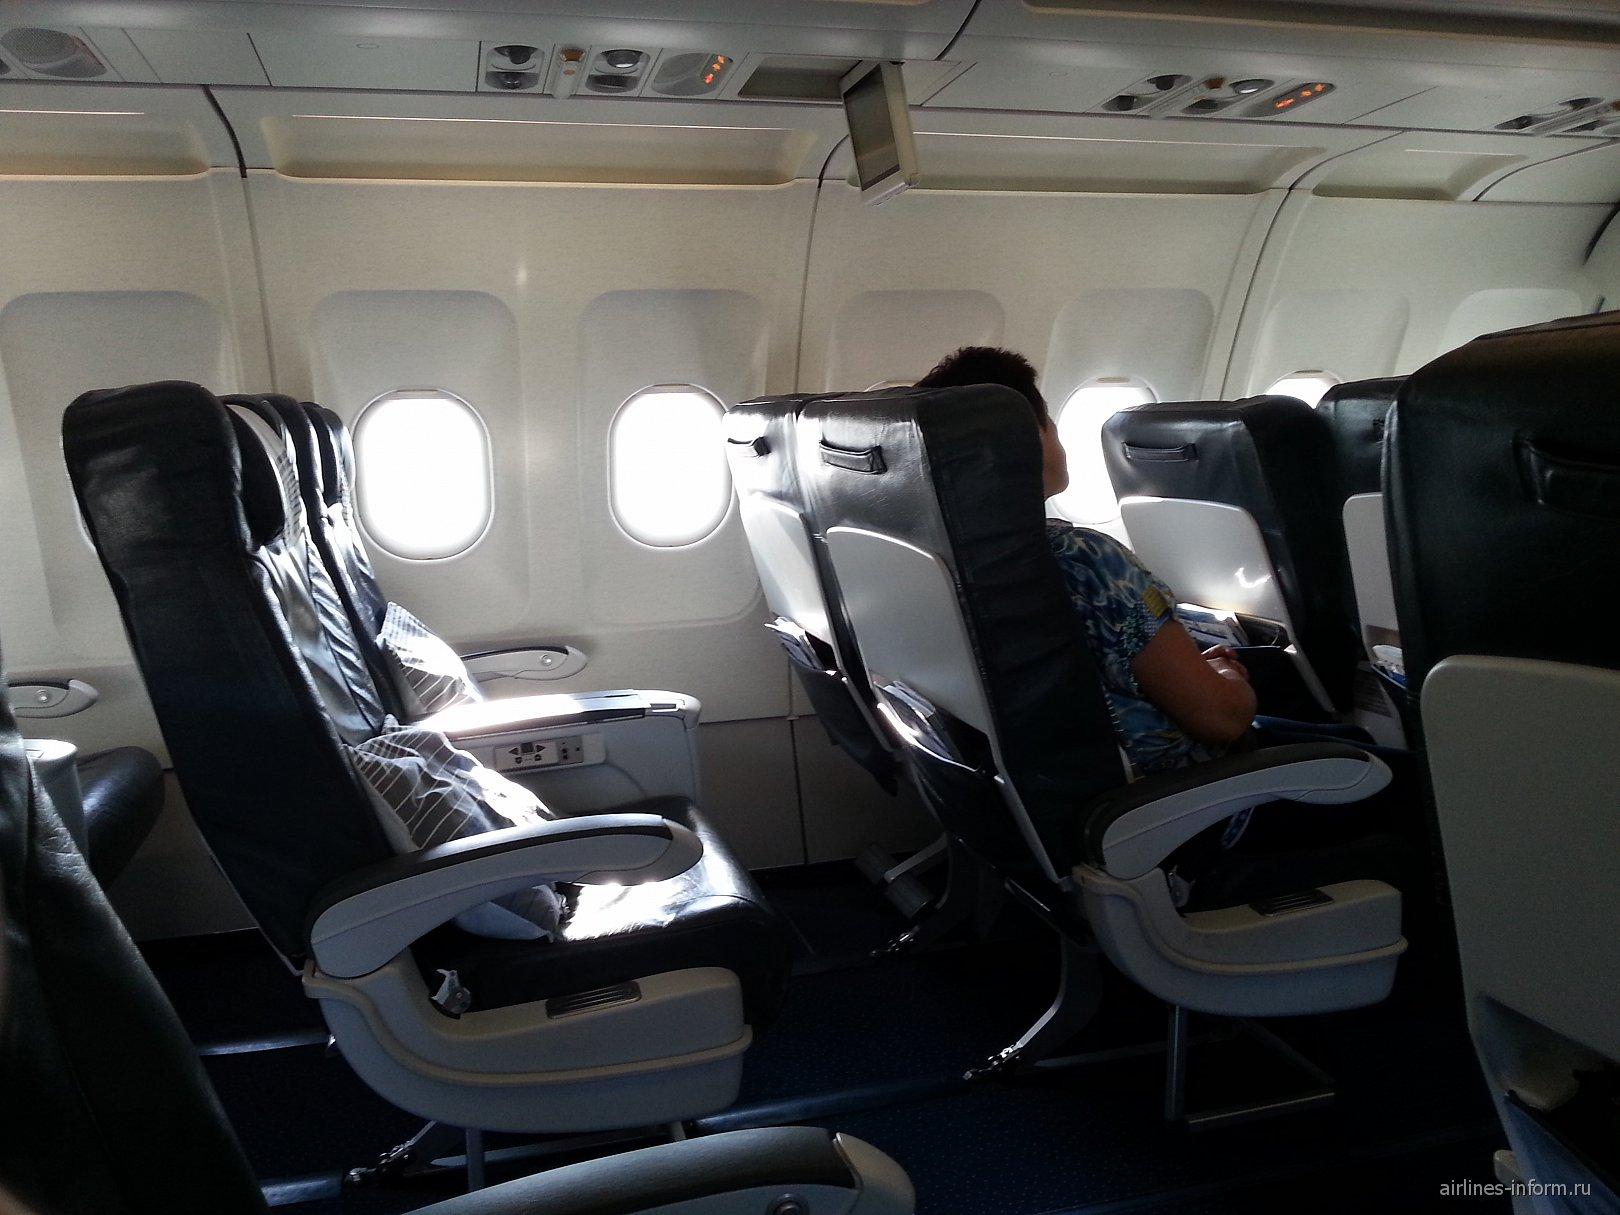 Салон бизнес-класса в самолете Airbus A321 авиакомпании Air Astana